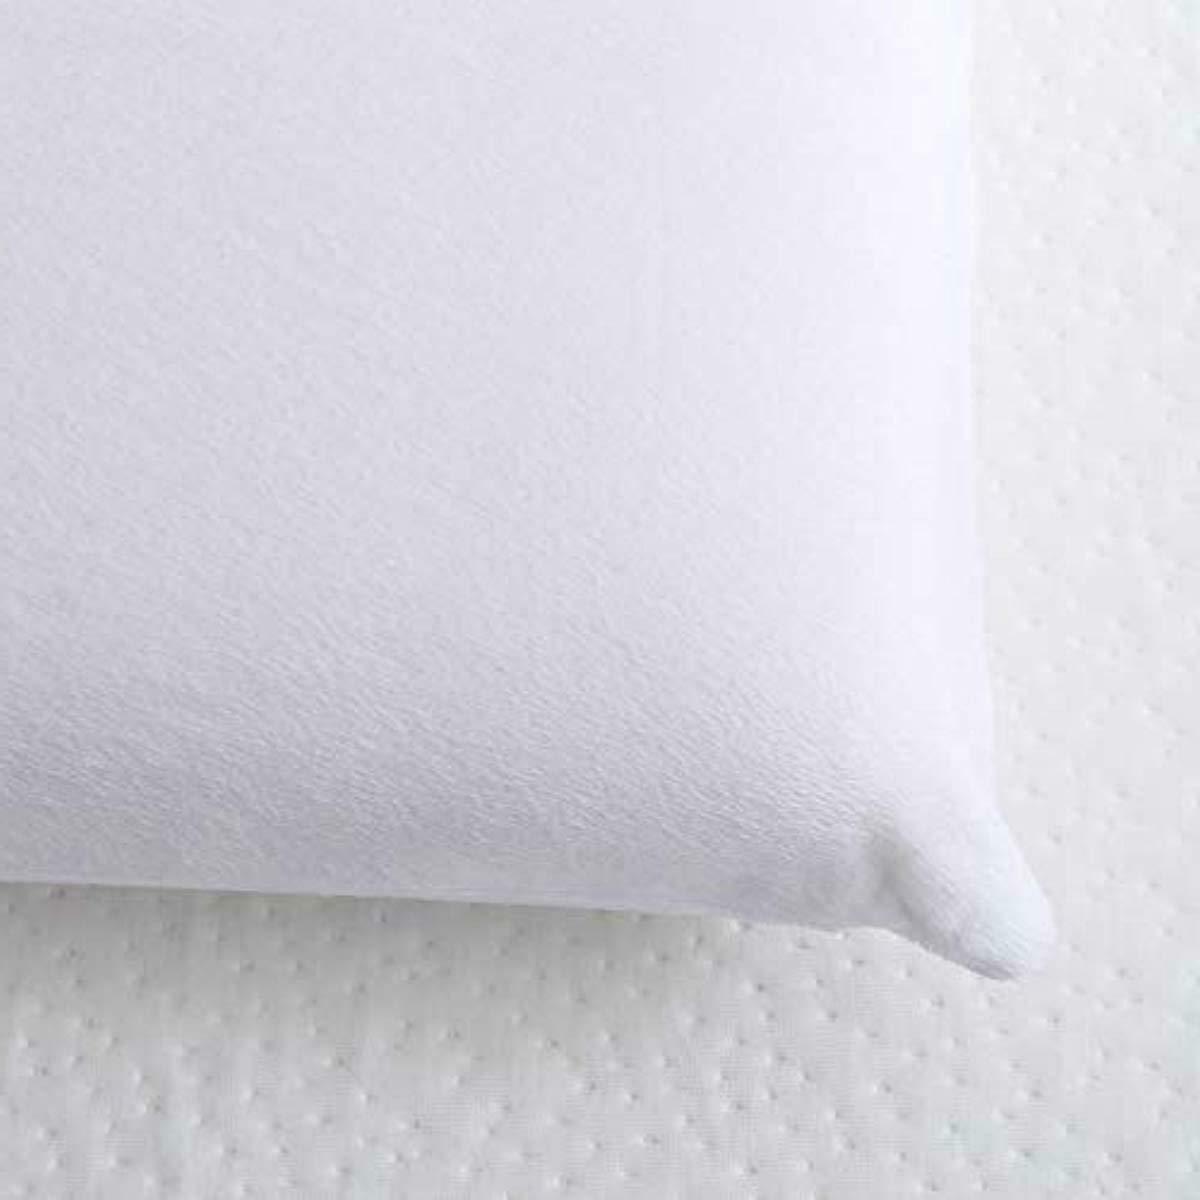 Classic Conforma Memory Foam Pillow, Queen